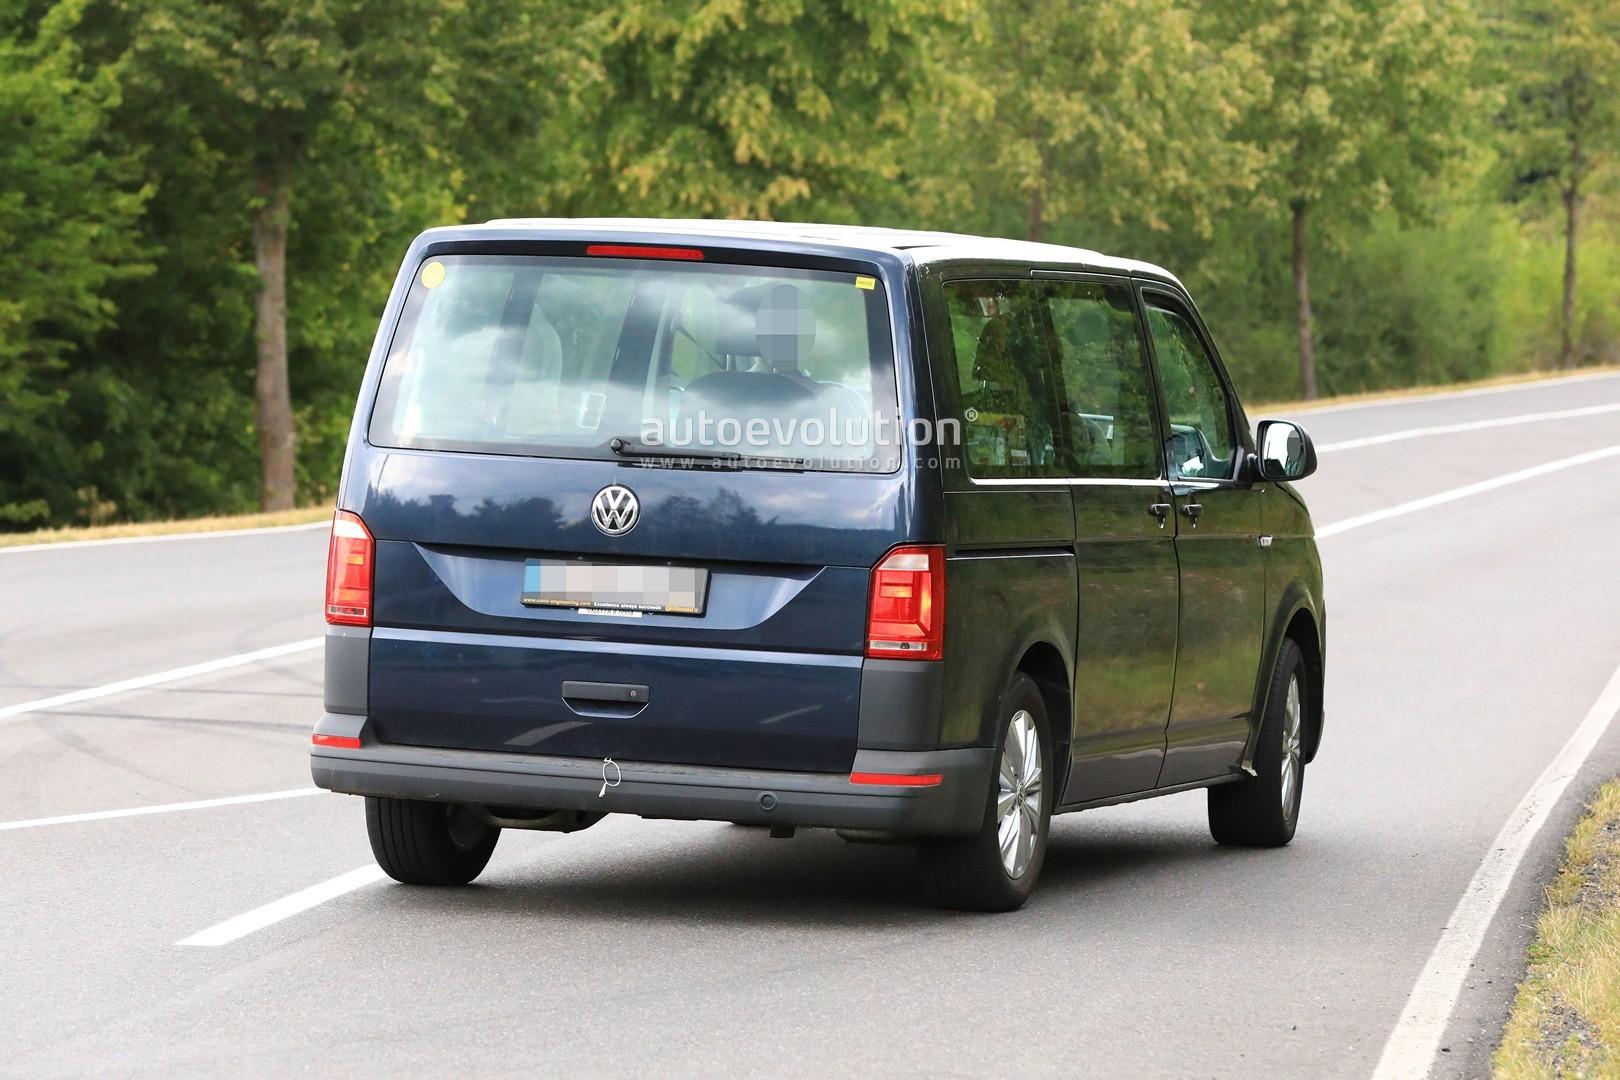 Spyshots: 2020 Volkswagen T7 Mule Might Be a Plug-in ...